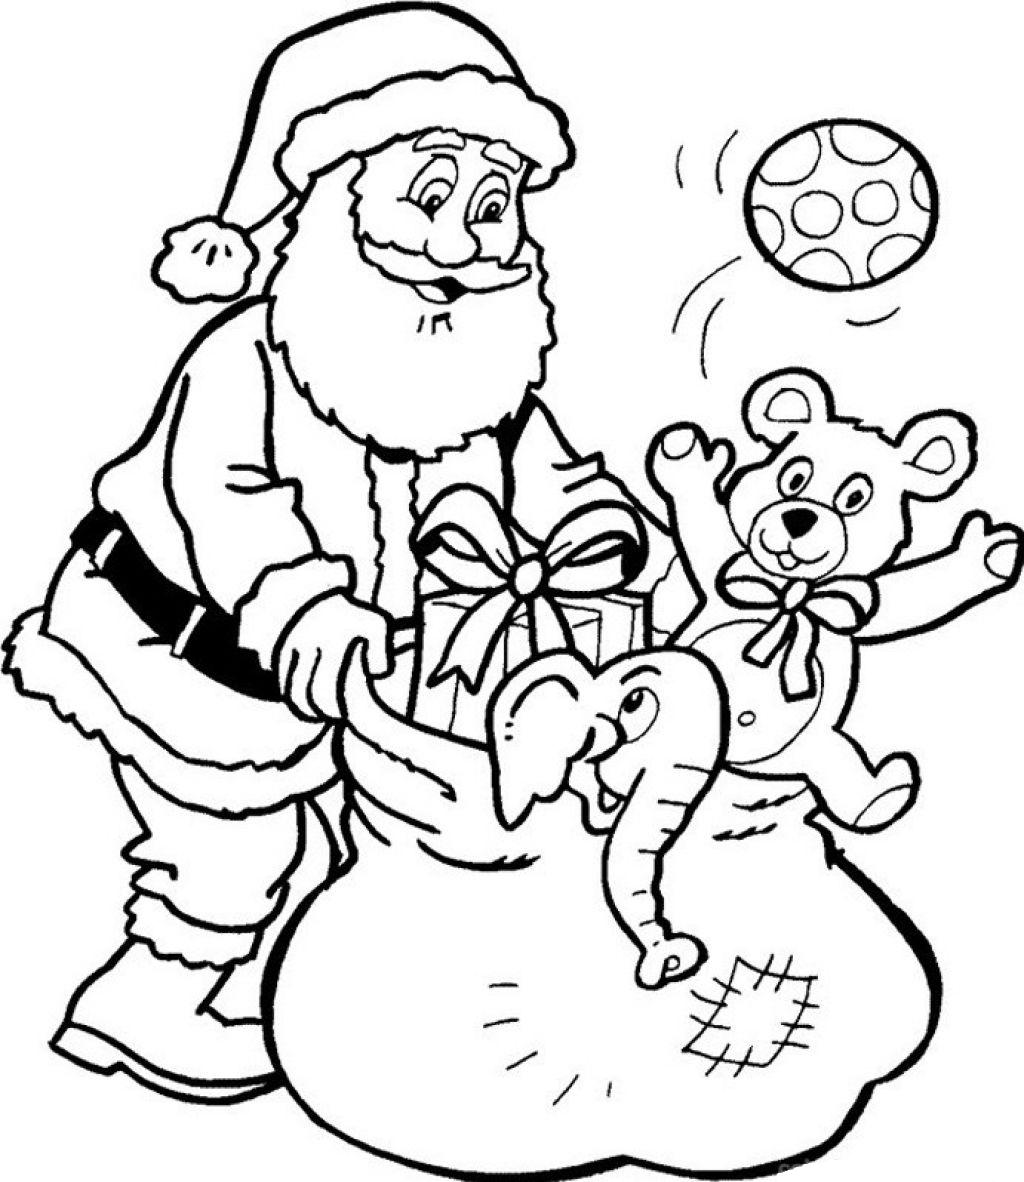 1024x1182 santa claus face with no beard coloring page331597 - Santa Claus Face Coloring Pages